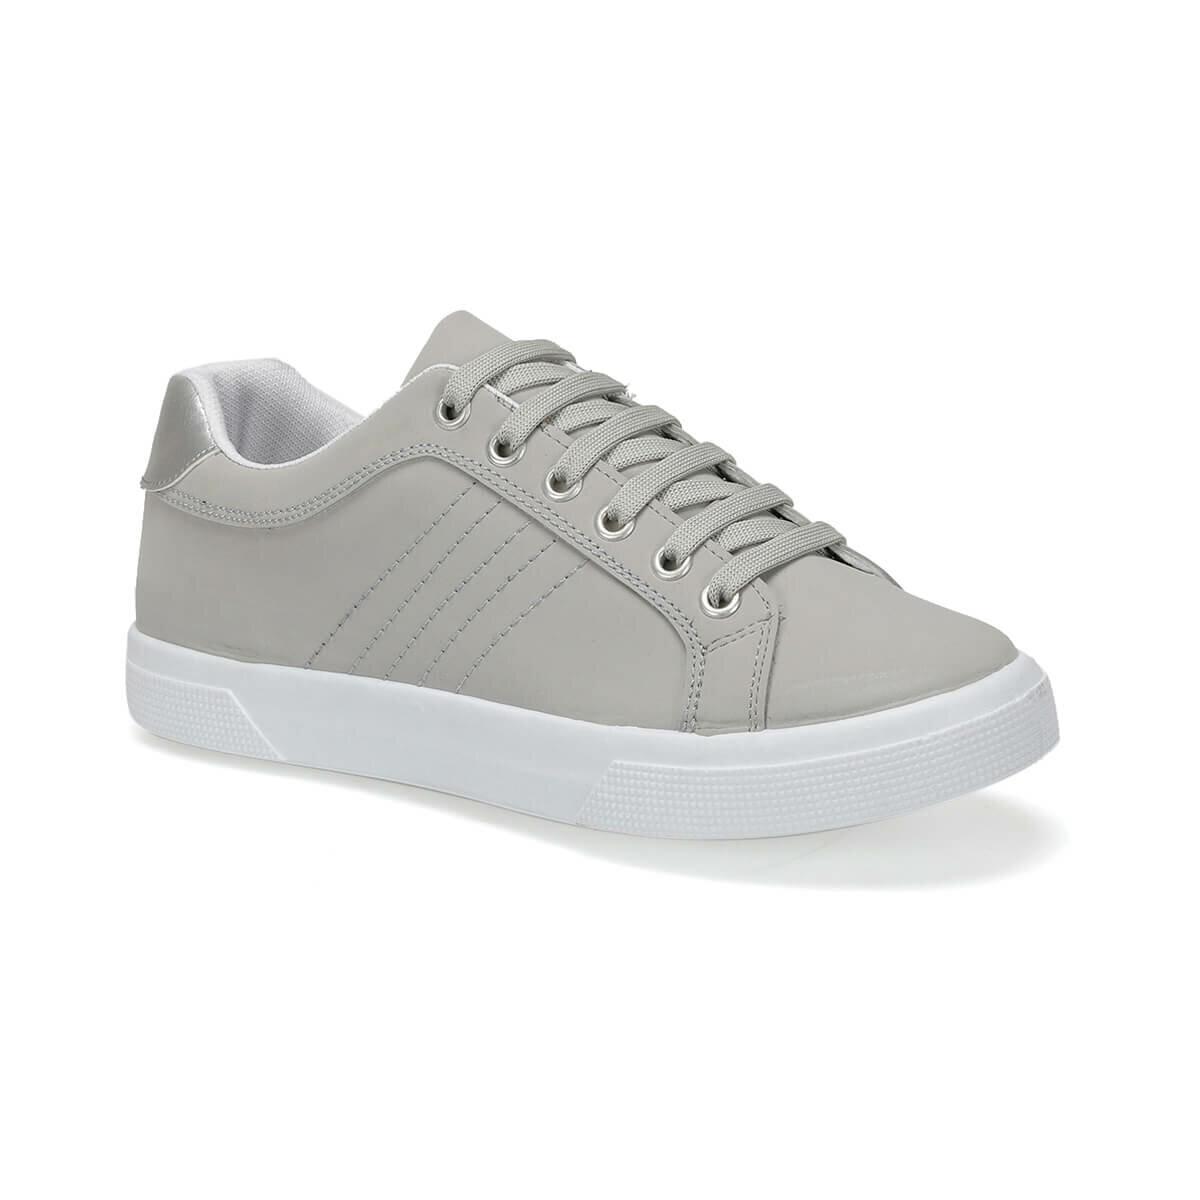 FLO 92.314873.Z Light Gray Women 'S Sneaker Shoes Polaris